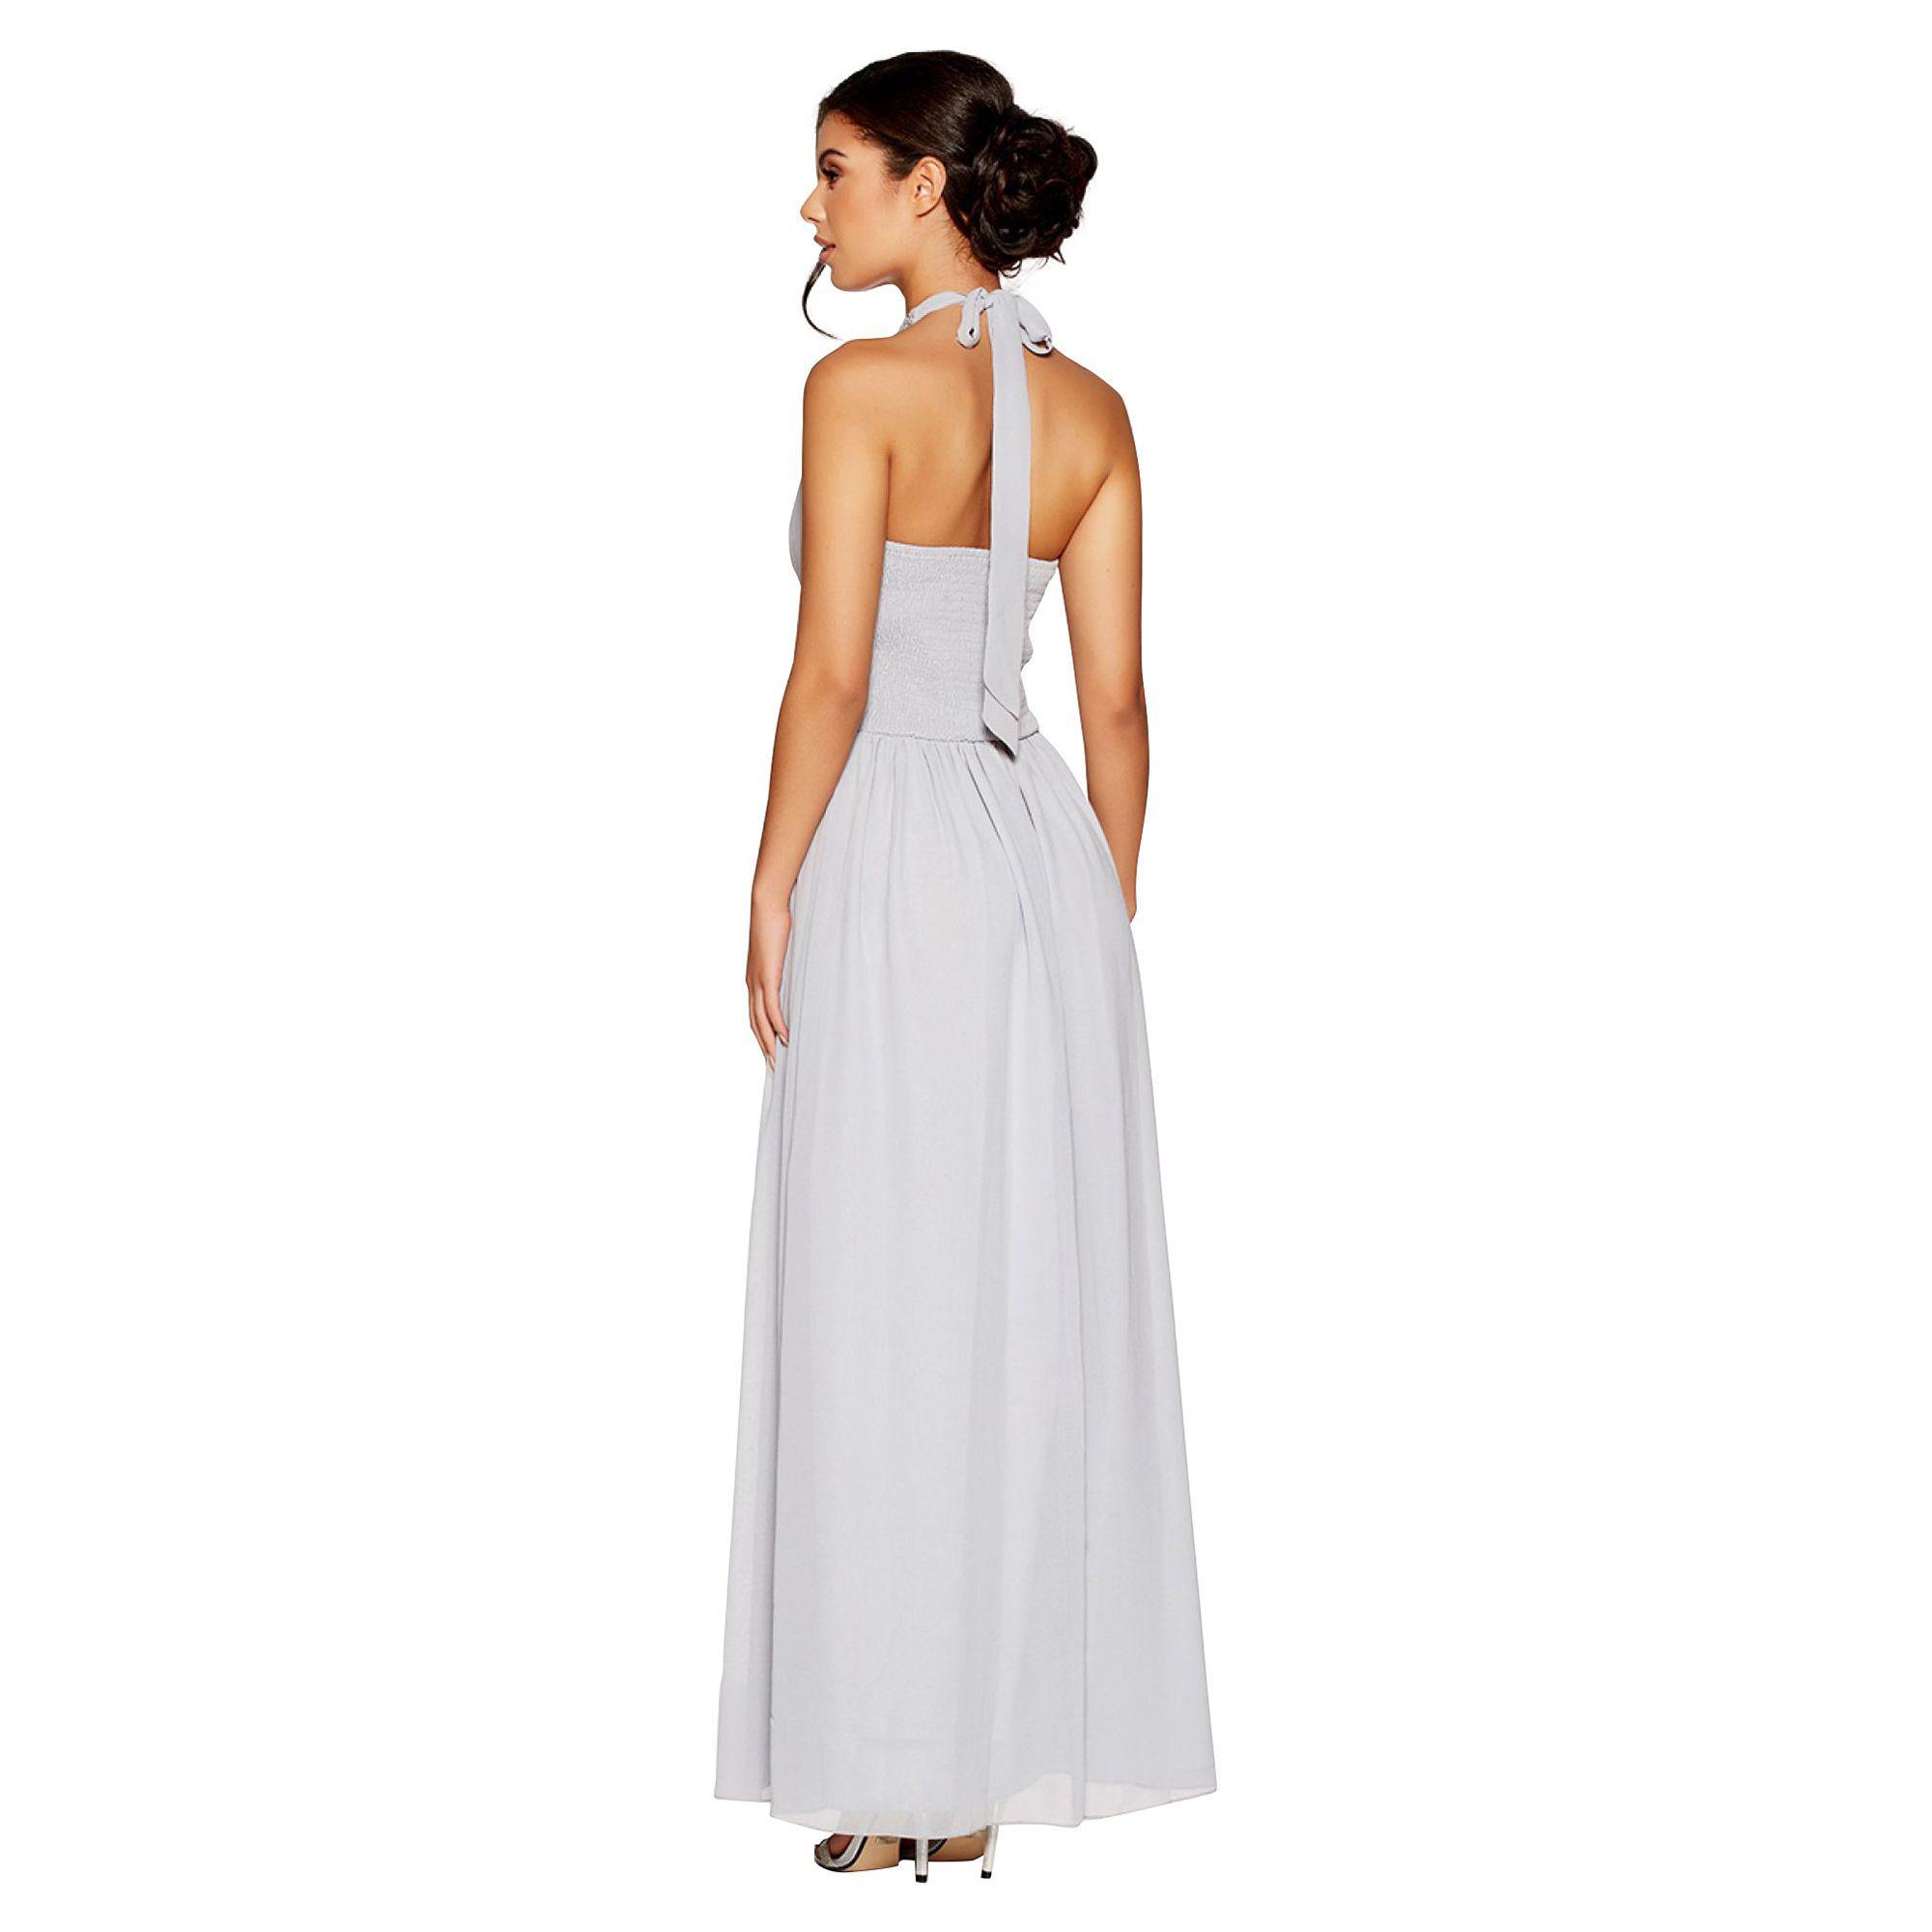 86ef0416e9a6 ... Quiz - Gray Grey Chiffon Embellished Keyhole Maxi Dress - Lyst. Visit  Debenhams. Tap to visit site